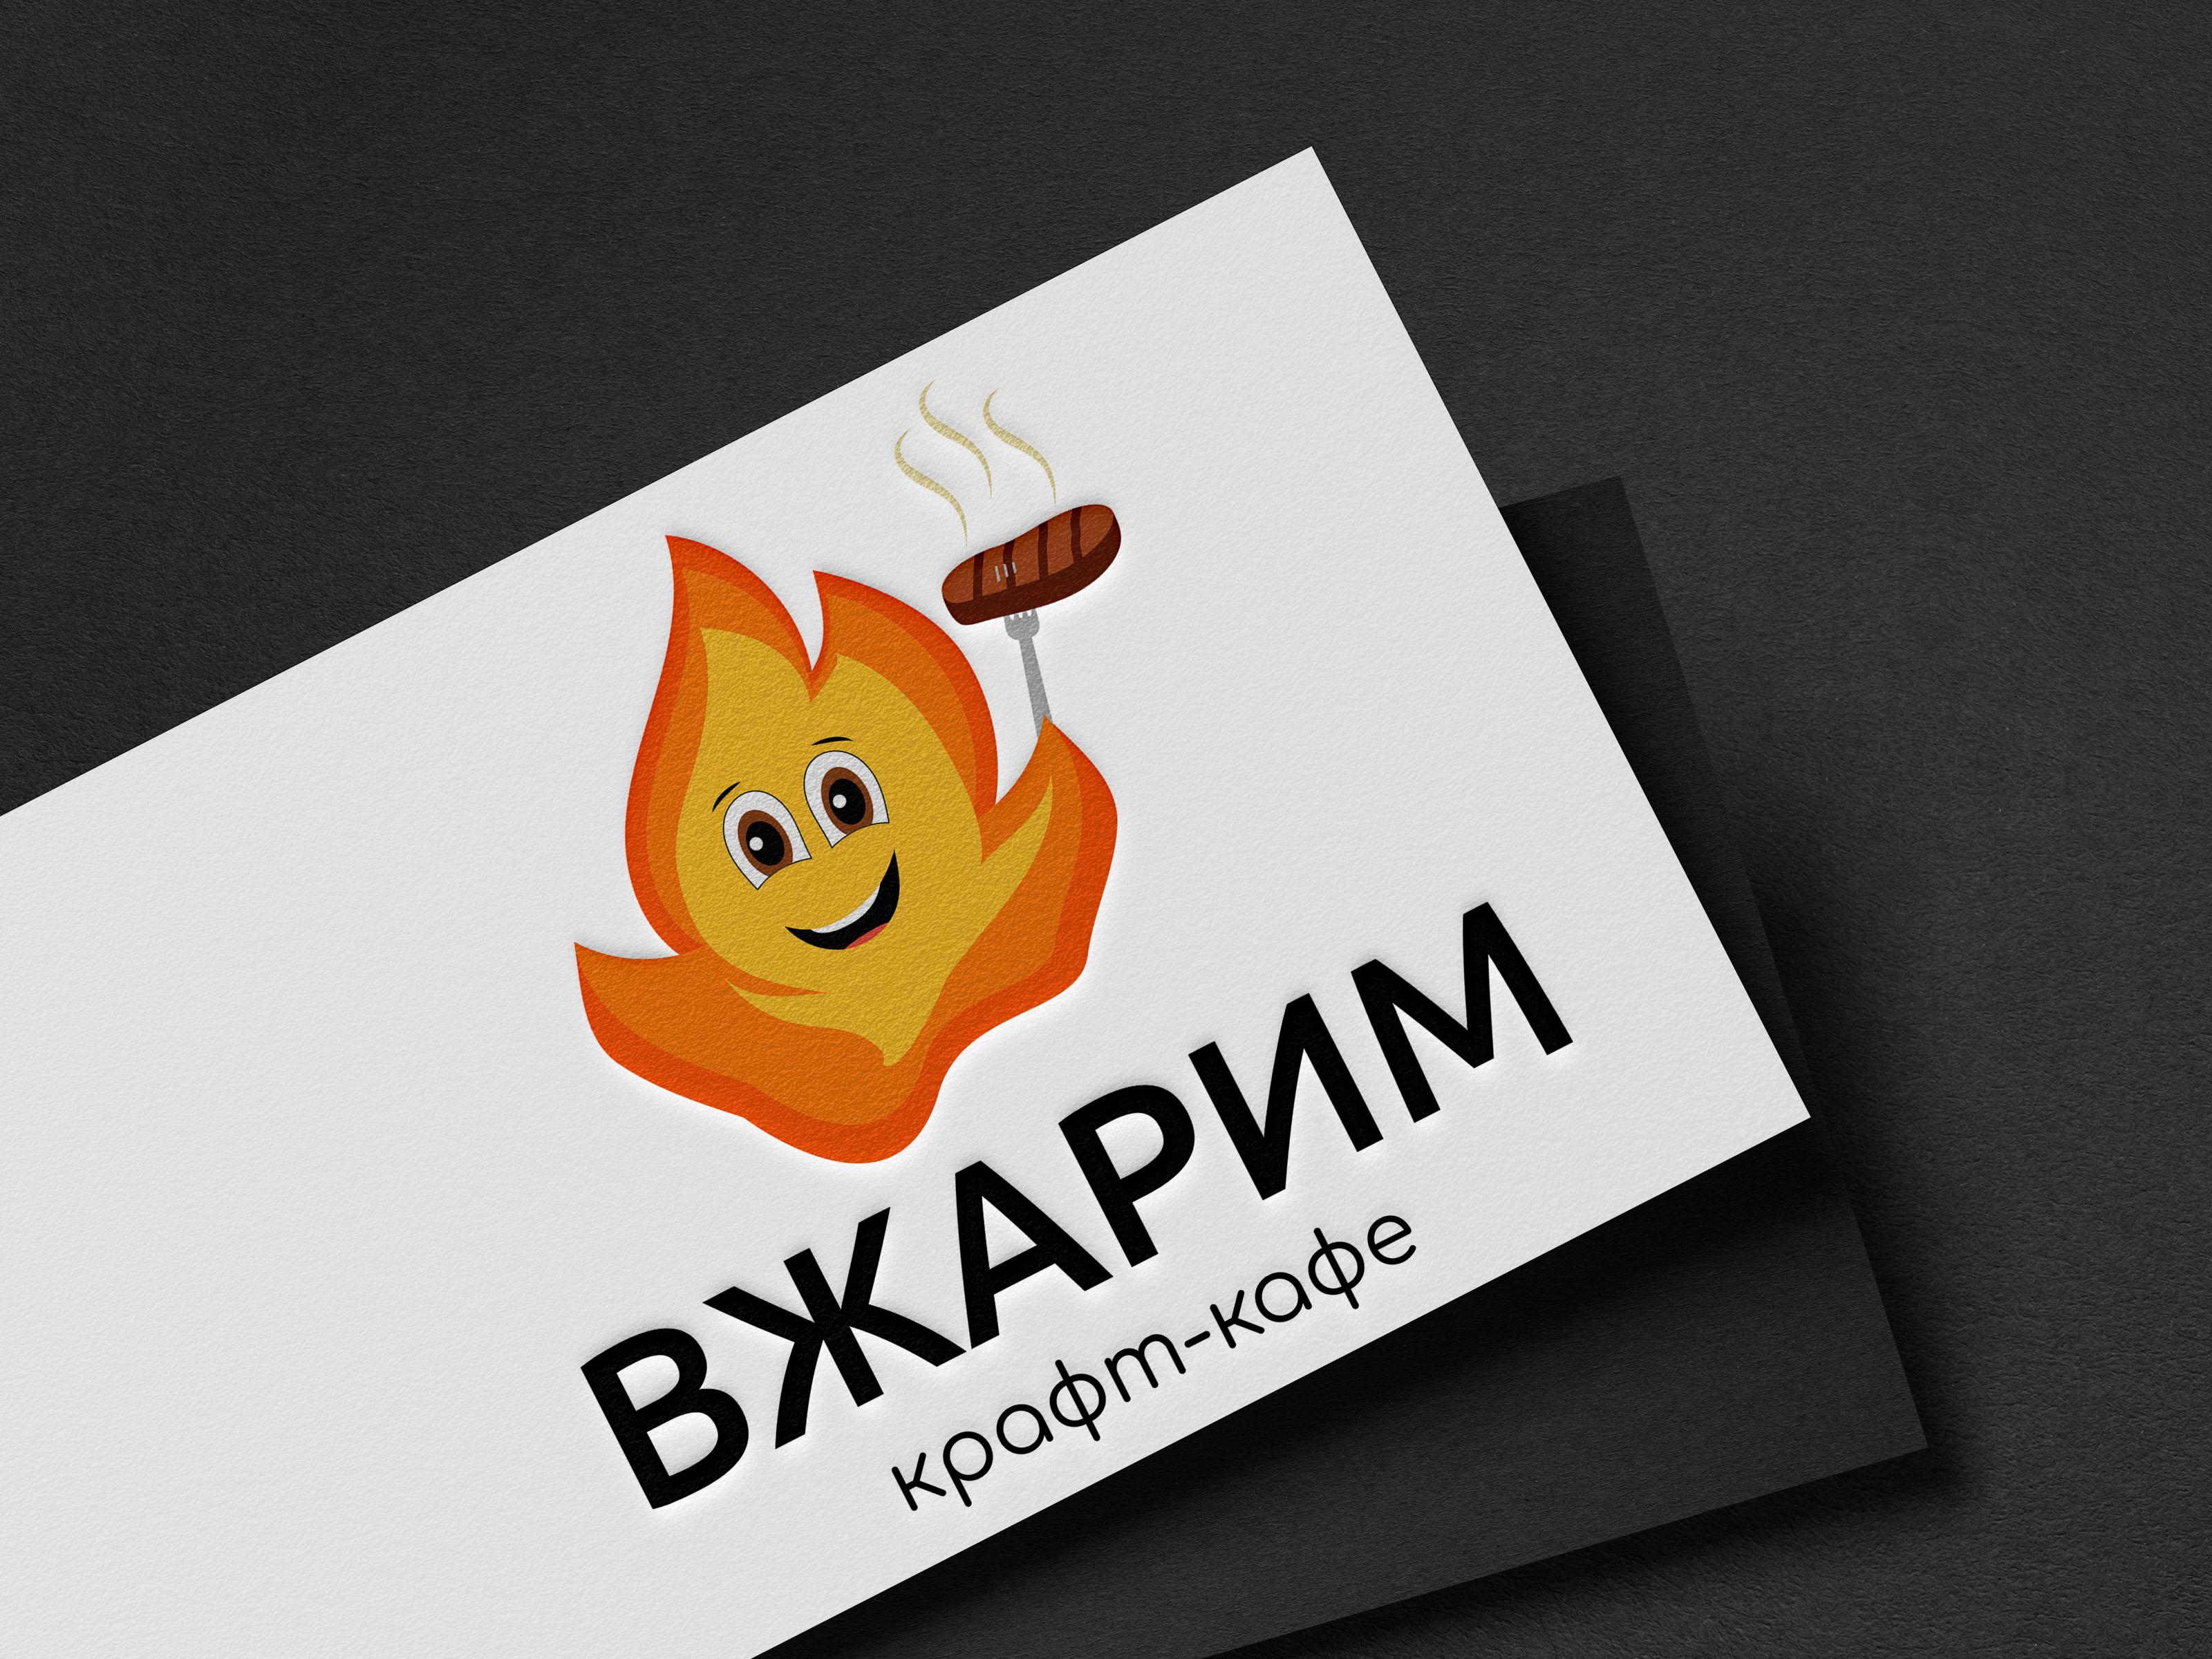 Требуется, разработка логотипа для крафт-кафе «ВЖАРИМ». фото f_5716017e60bea5c8.jpg